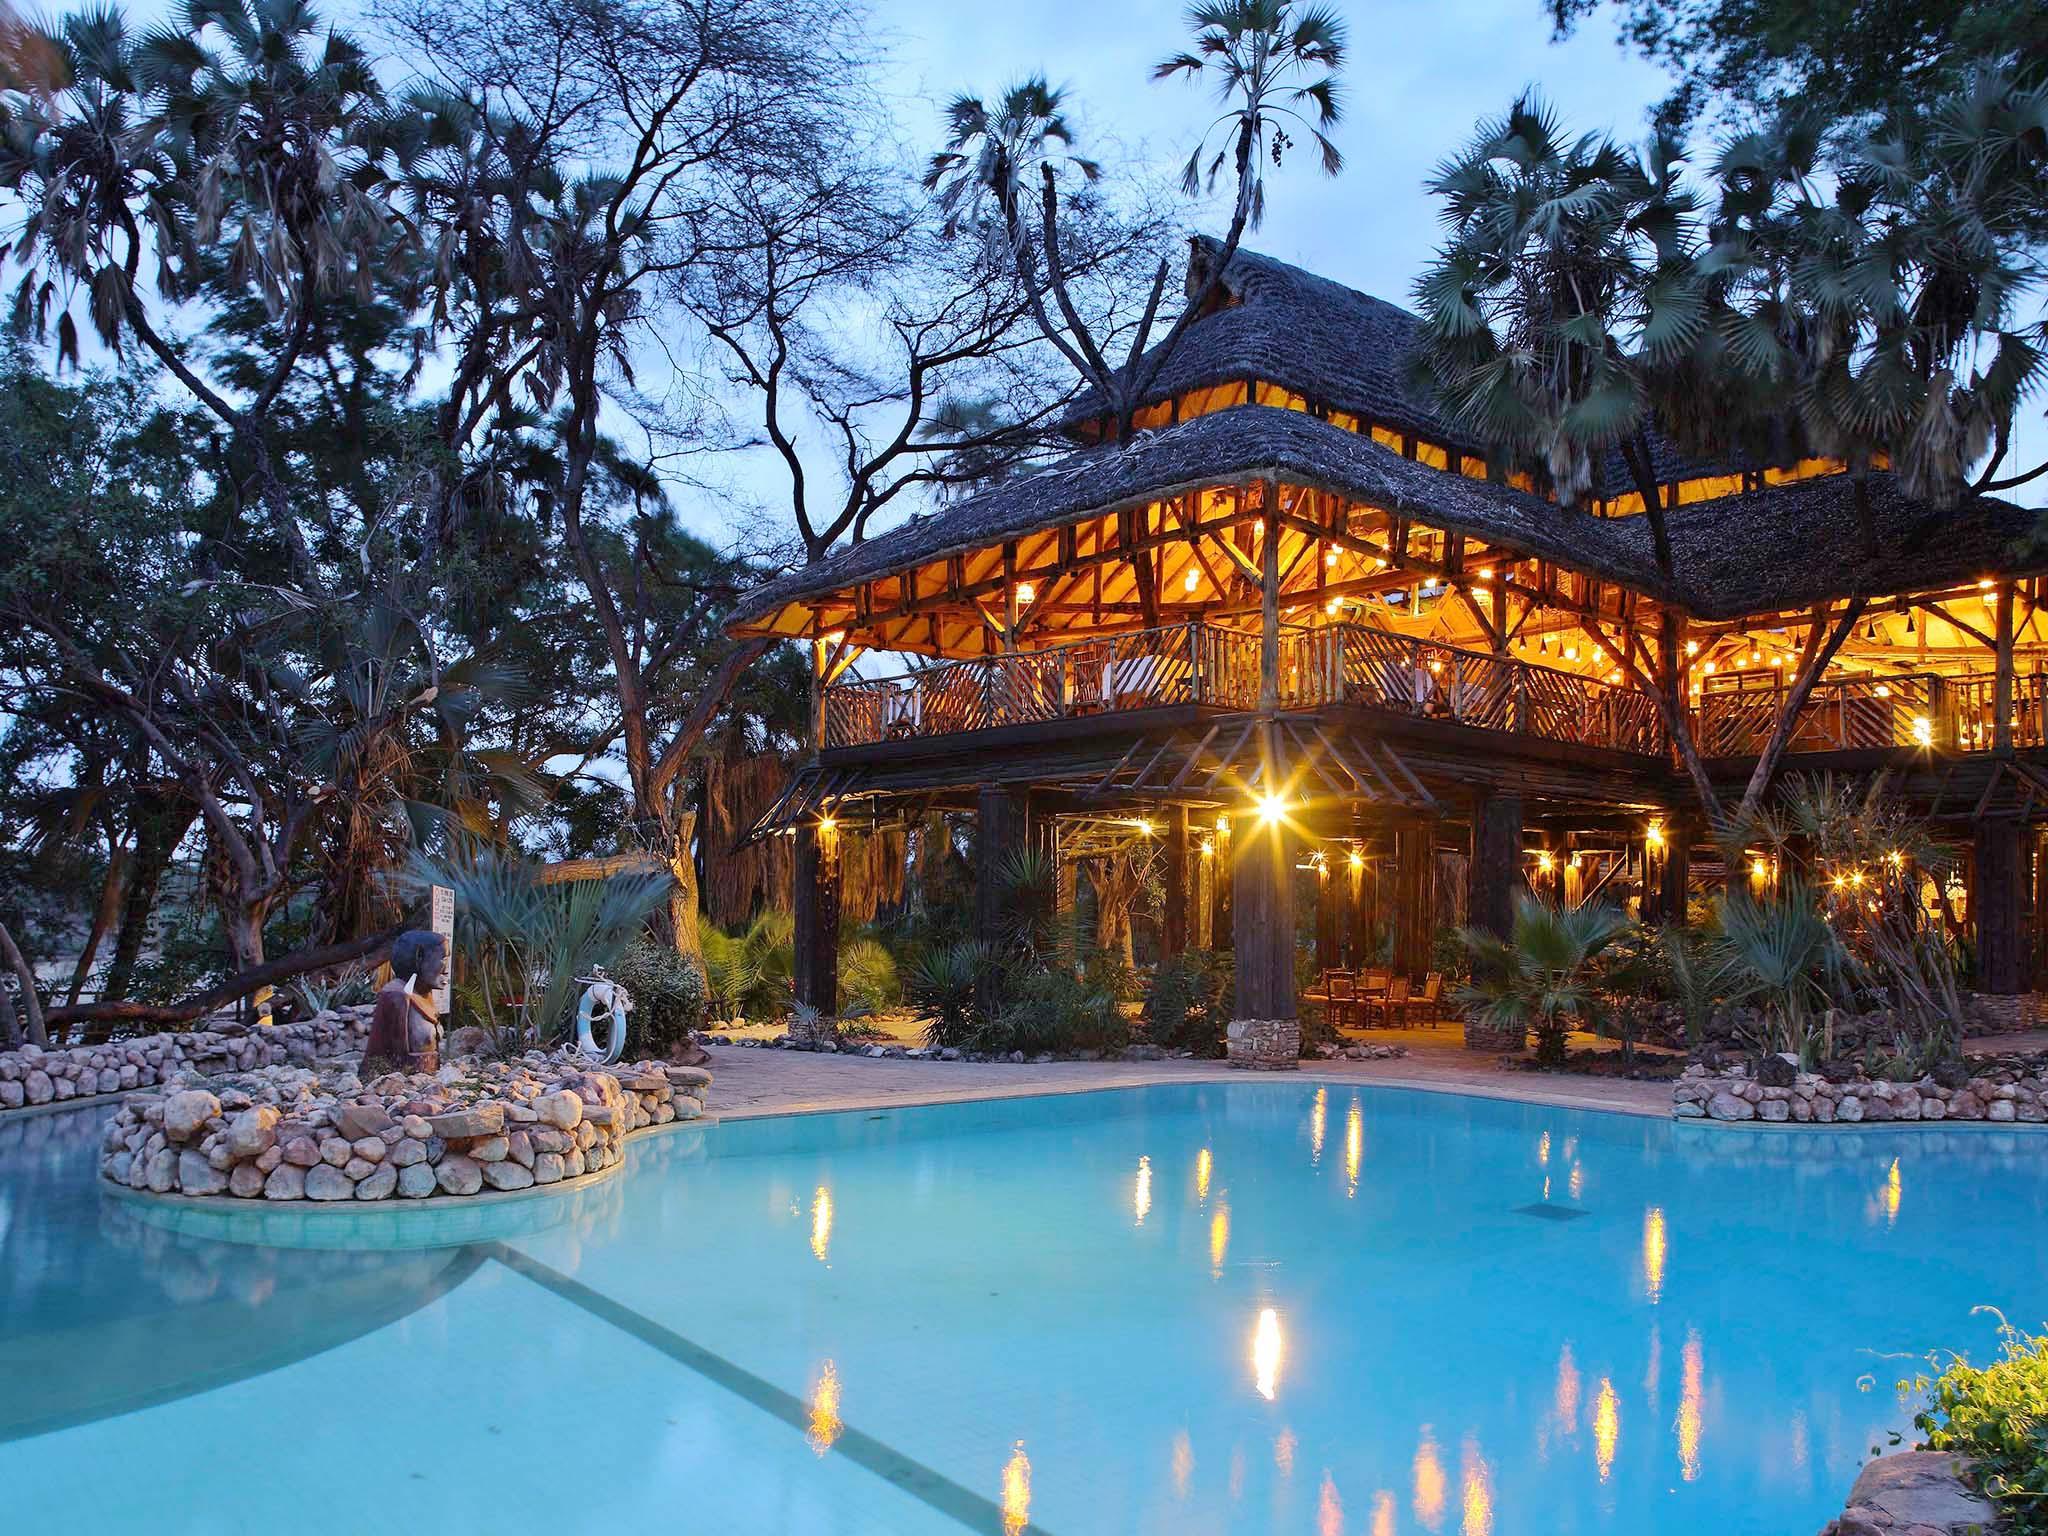 Day 3 - Sarova Shaba Game Lodge, Shaba National Reserve